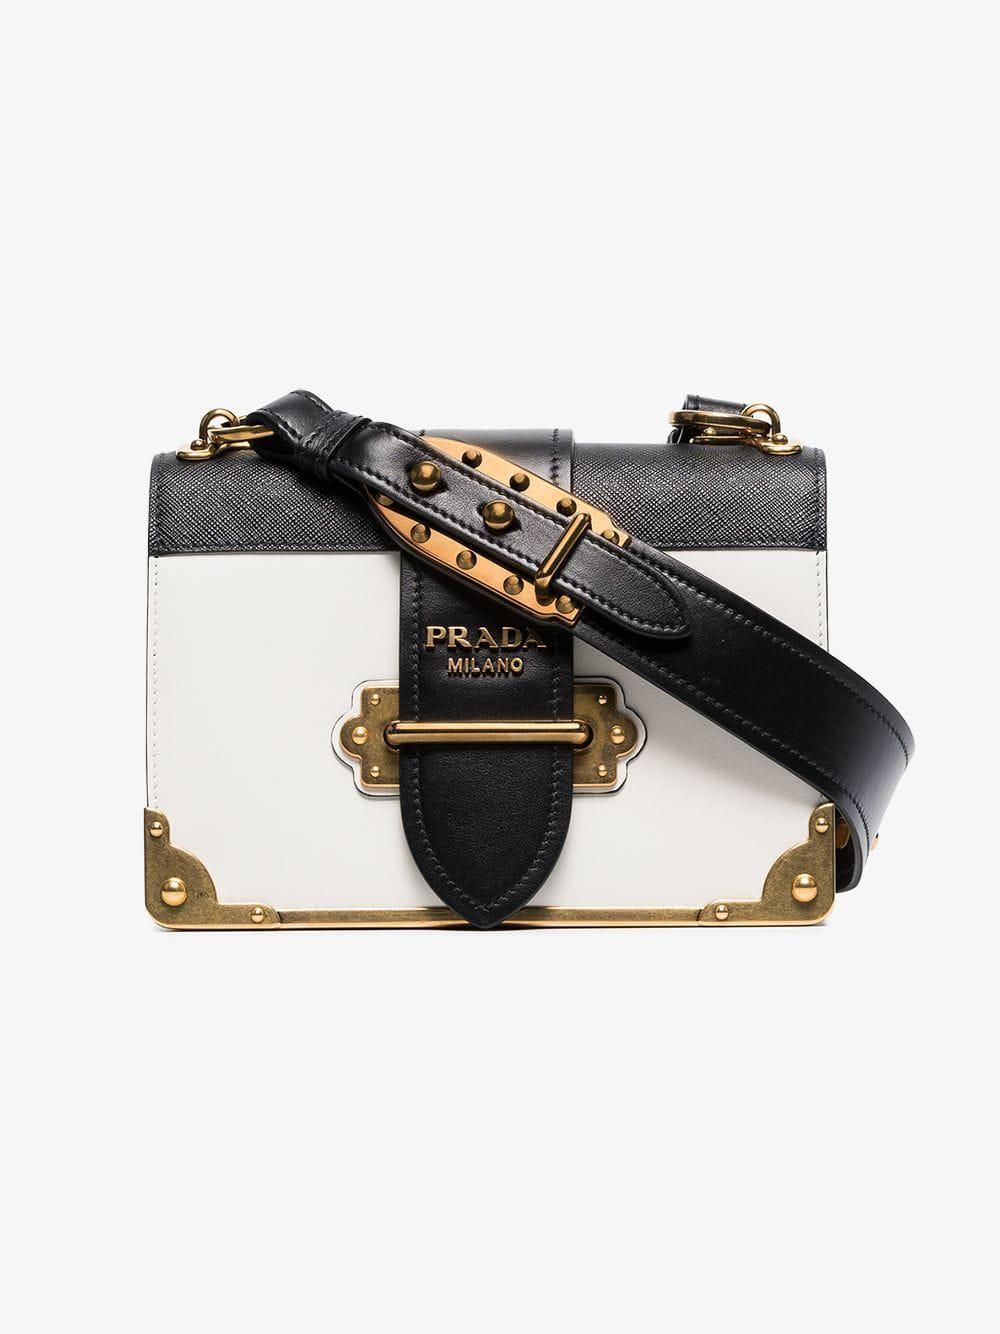 35f3cf5672ba Lyst - Prada Black And White Cahier Leather Bag in White